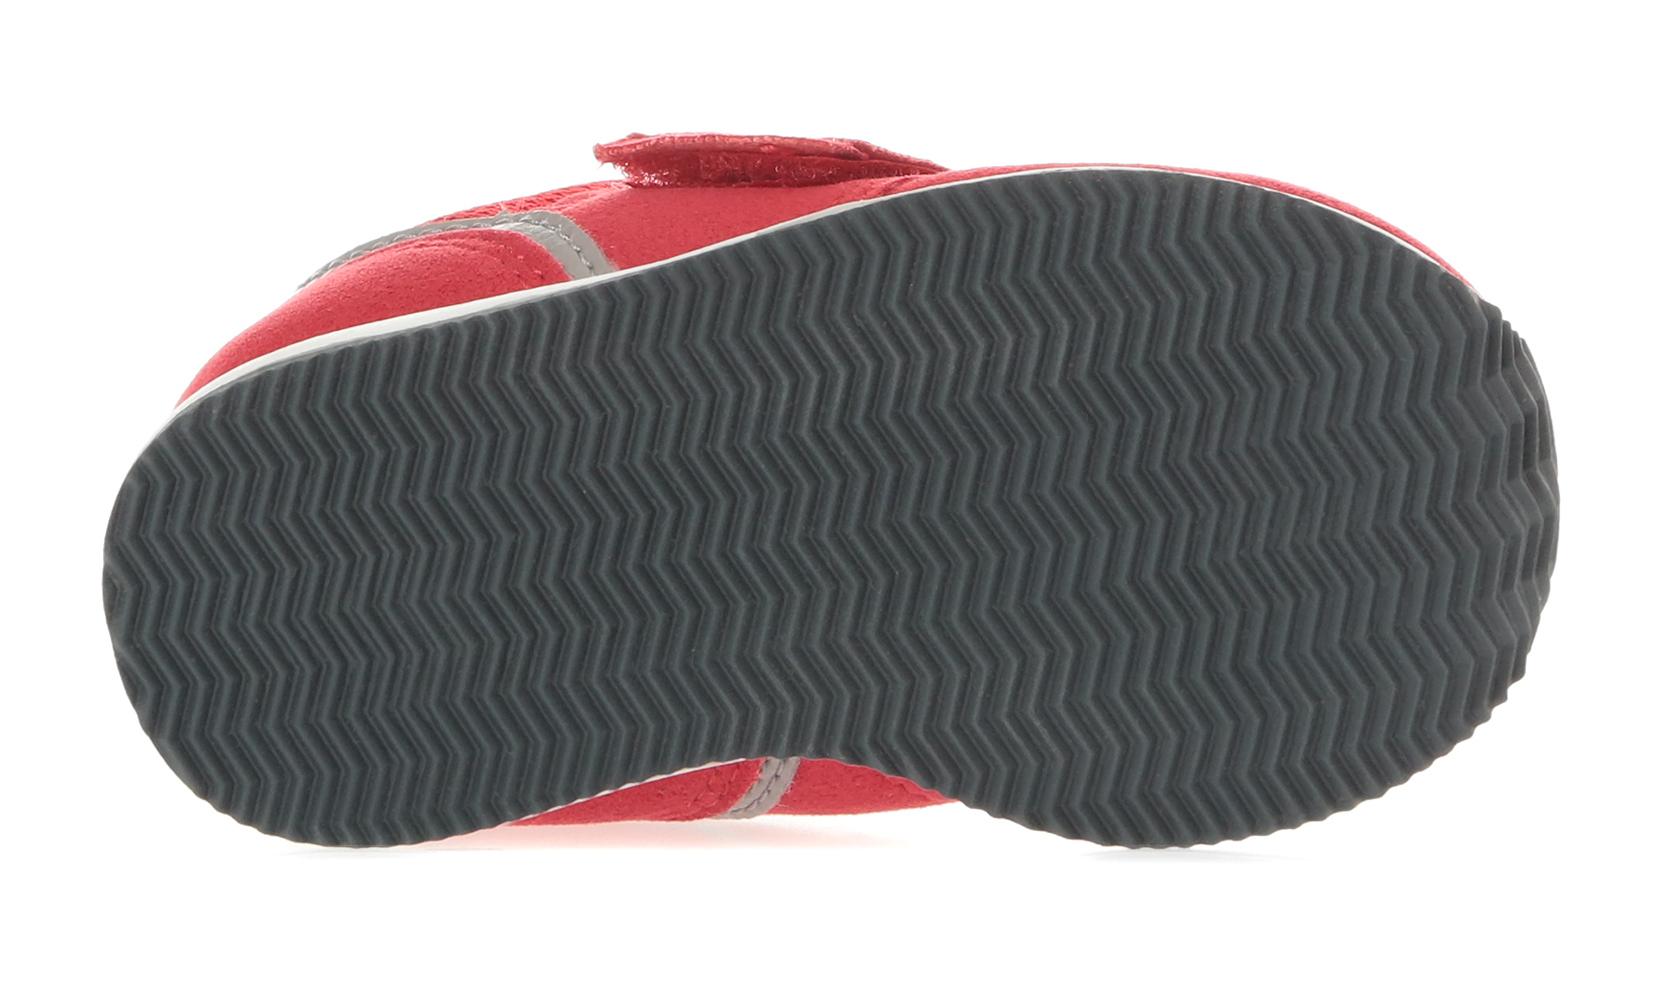 New Balance 996 IV996CRD | New Balance